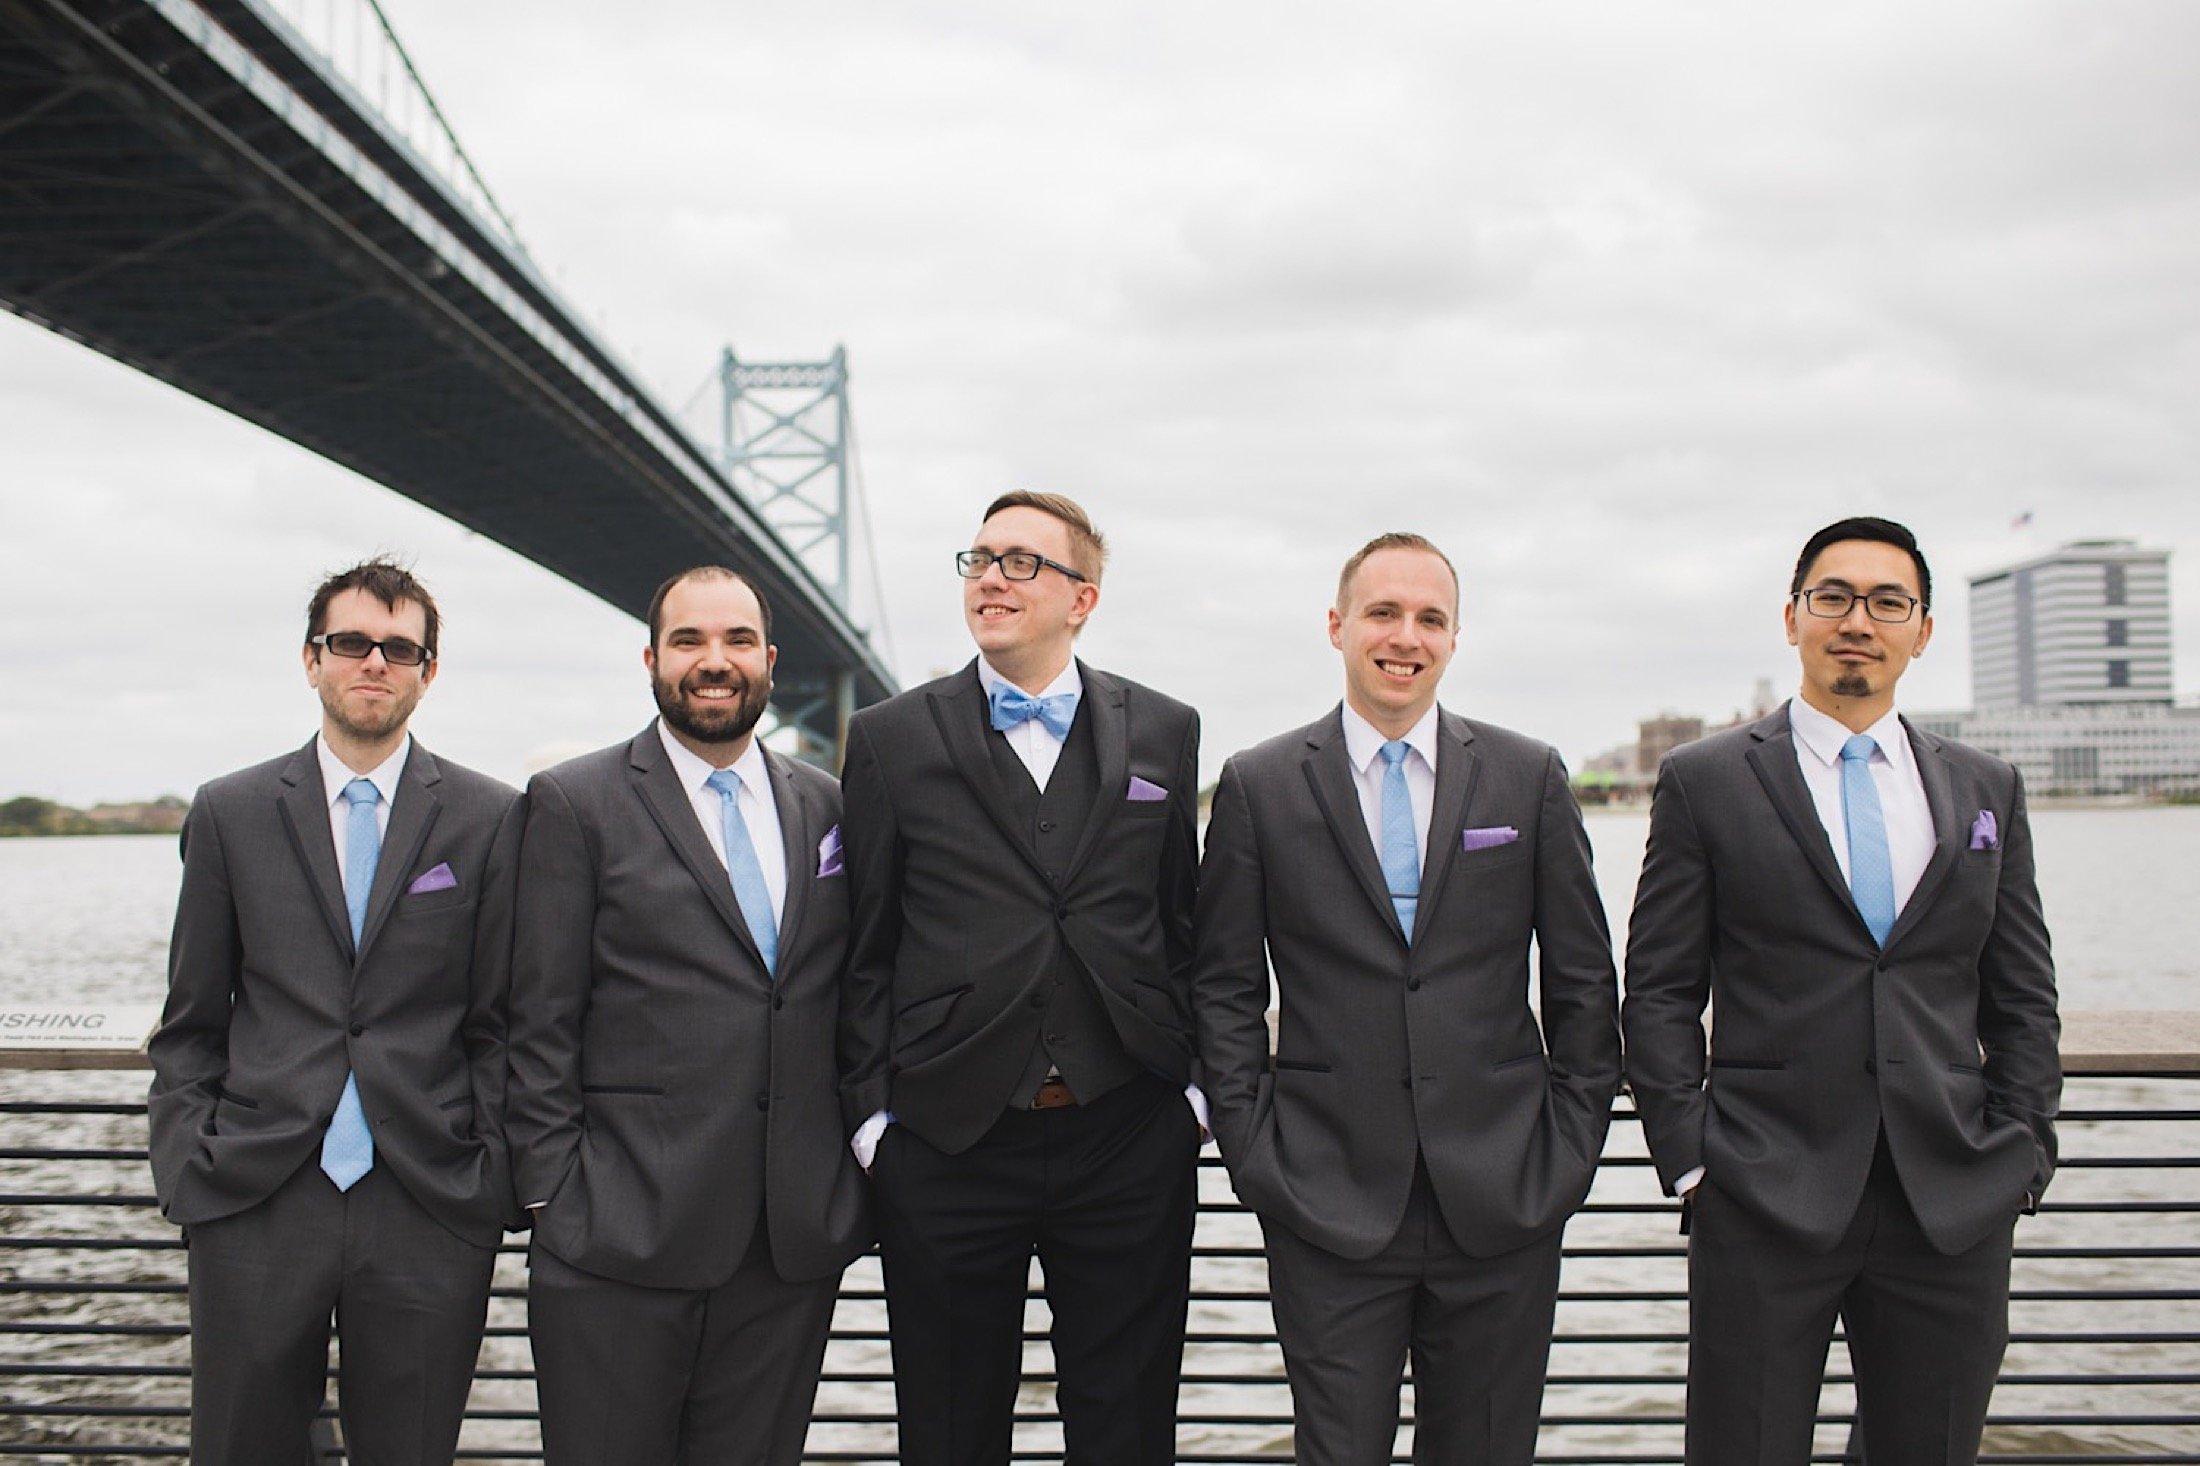 Race Street Pier wedding, photography